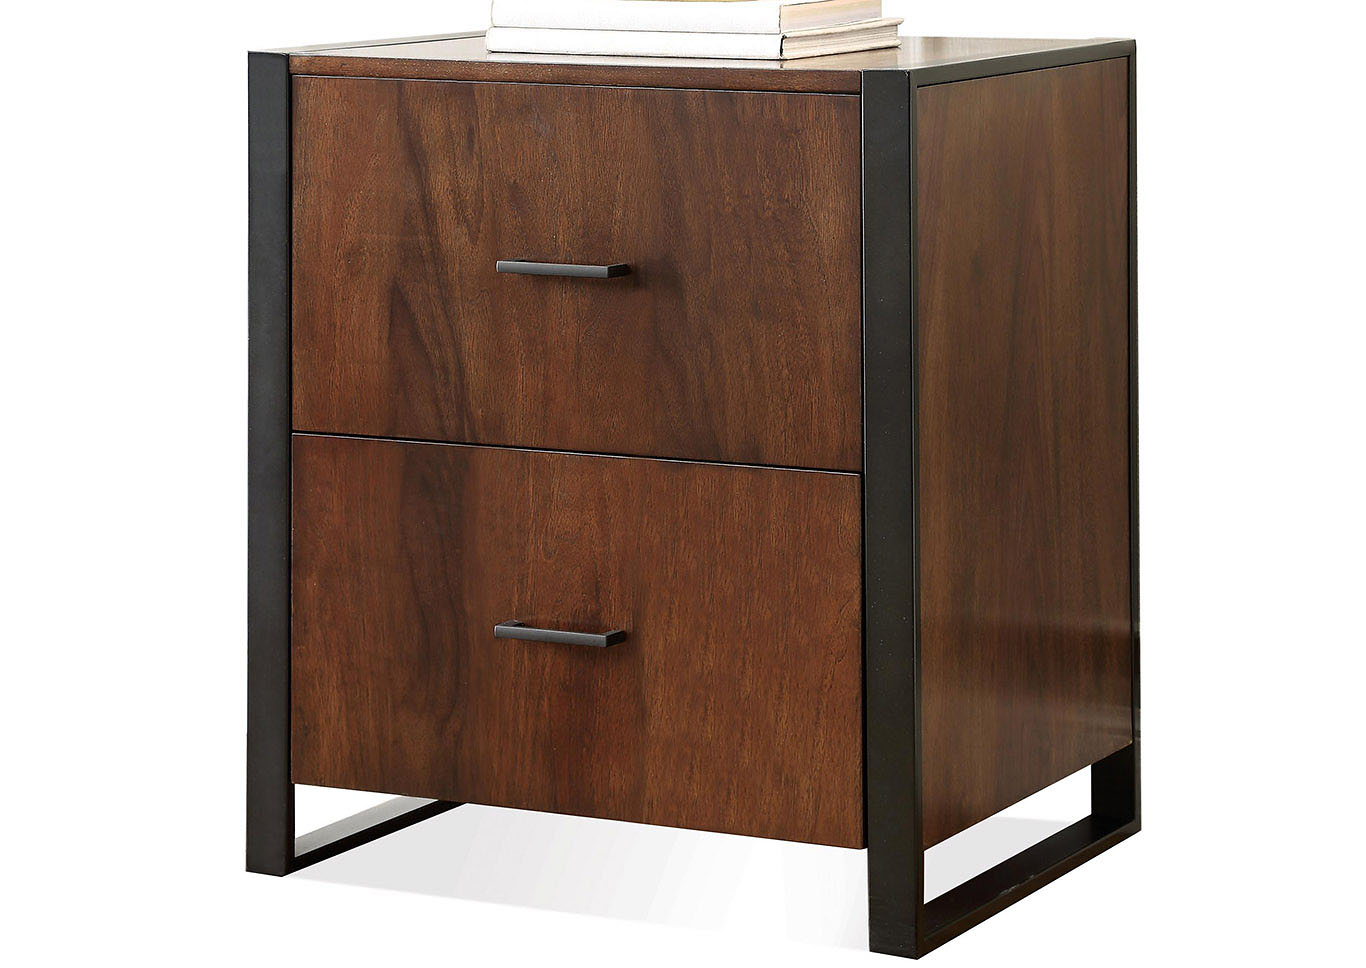 Merveilleux Terra Vista Walnut File Cabinet,Riverside